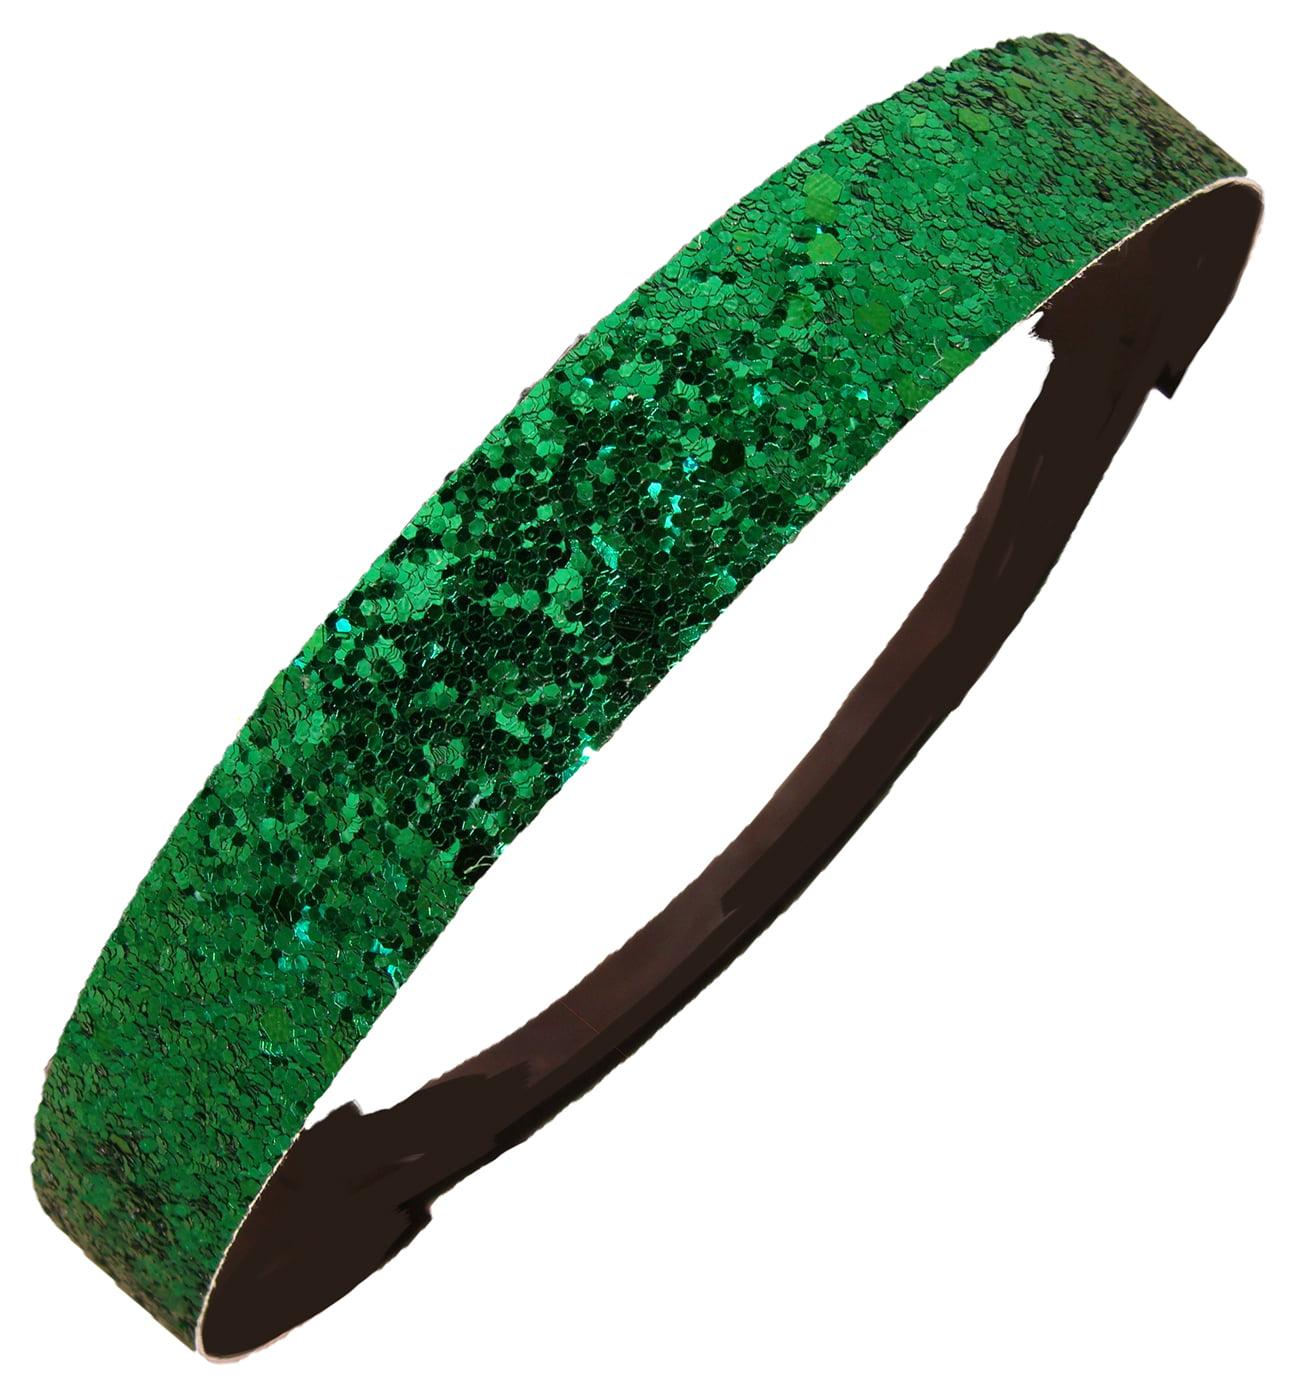 New Glittering Elastic Stretch Sport Hair Headband Bands 6 pieces